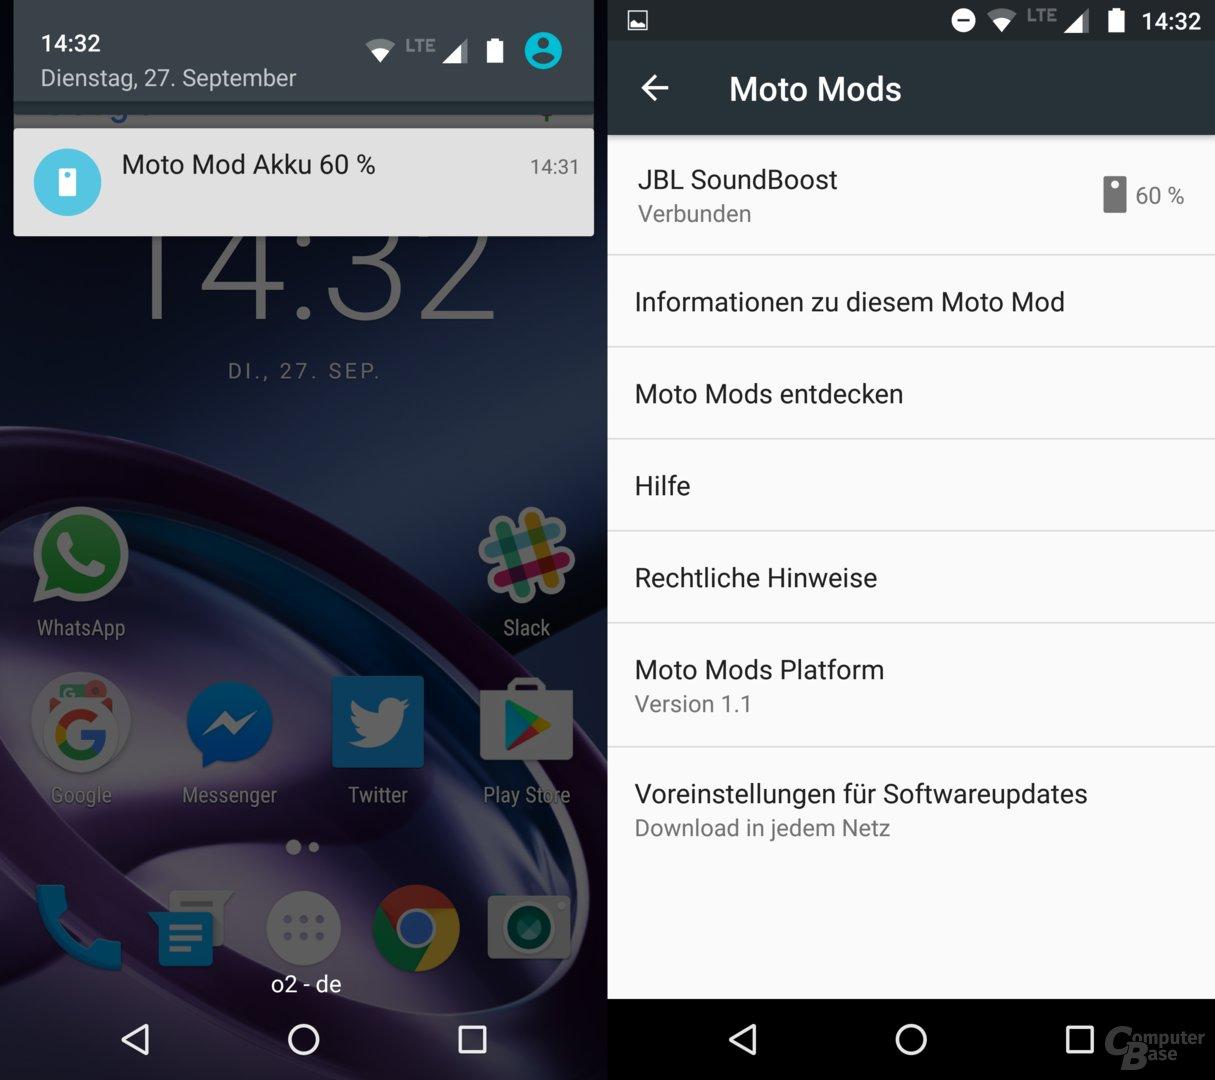 MotoMods auf dem Smartphone